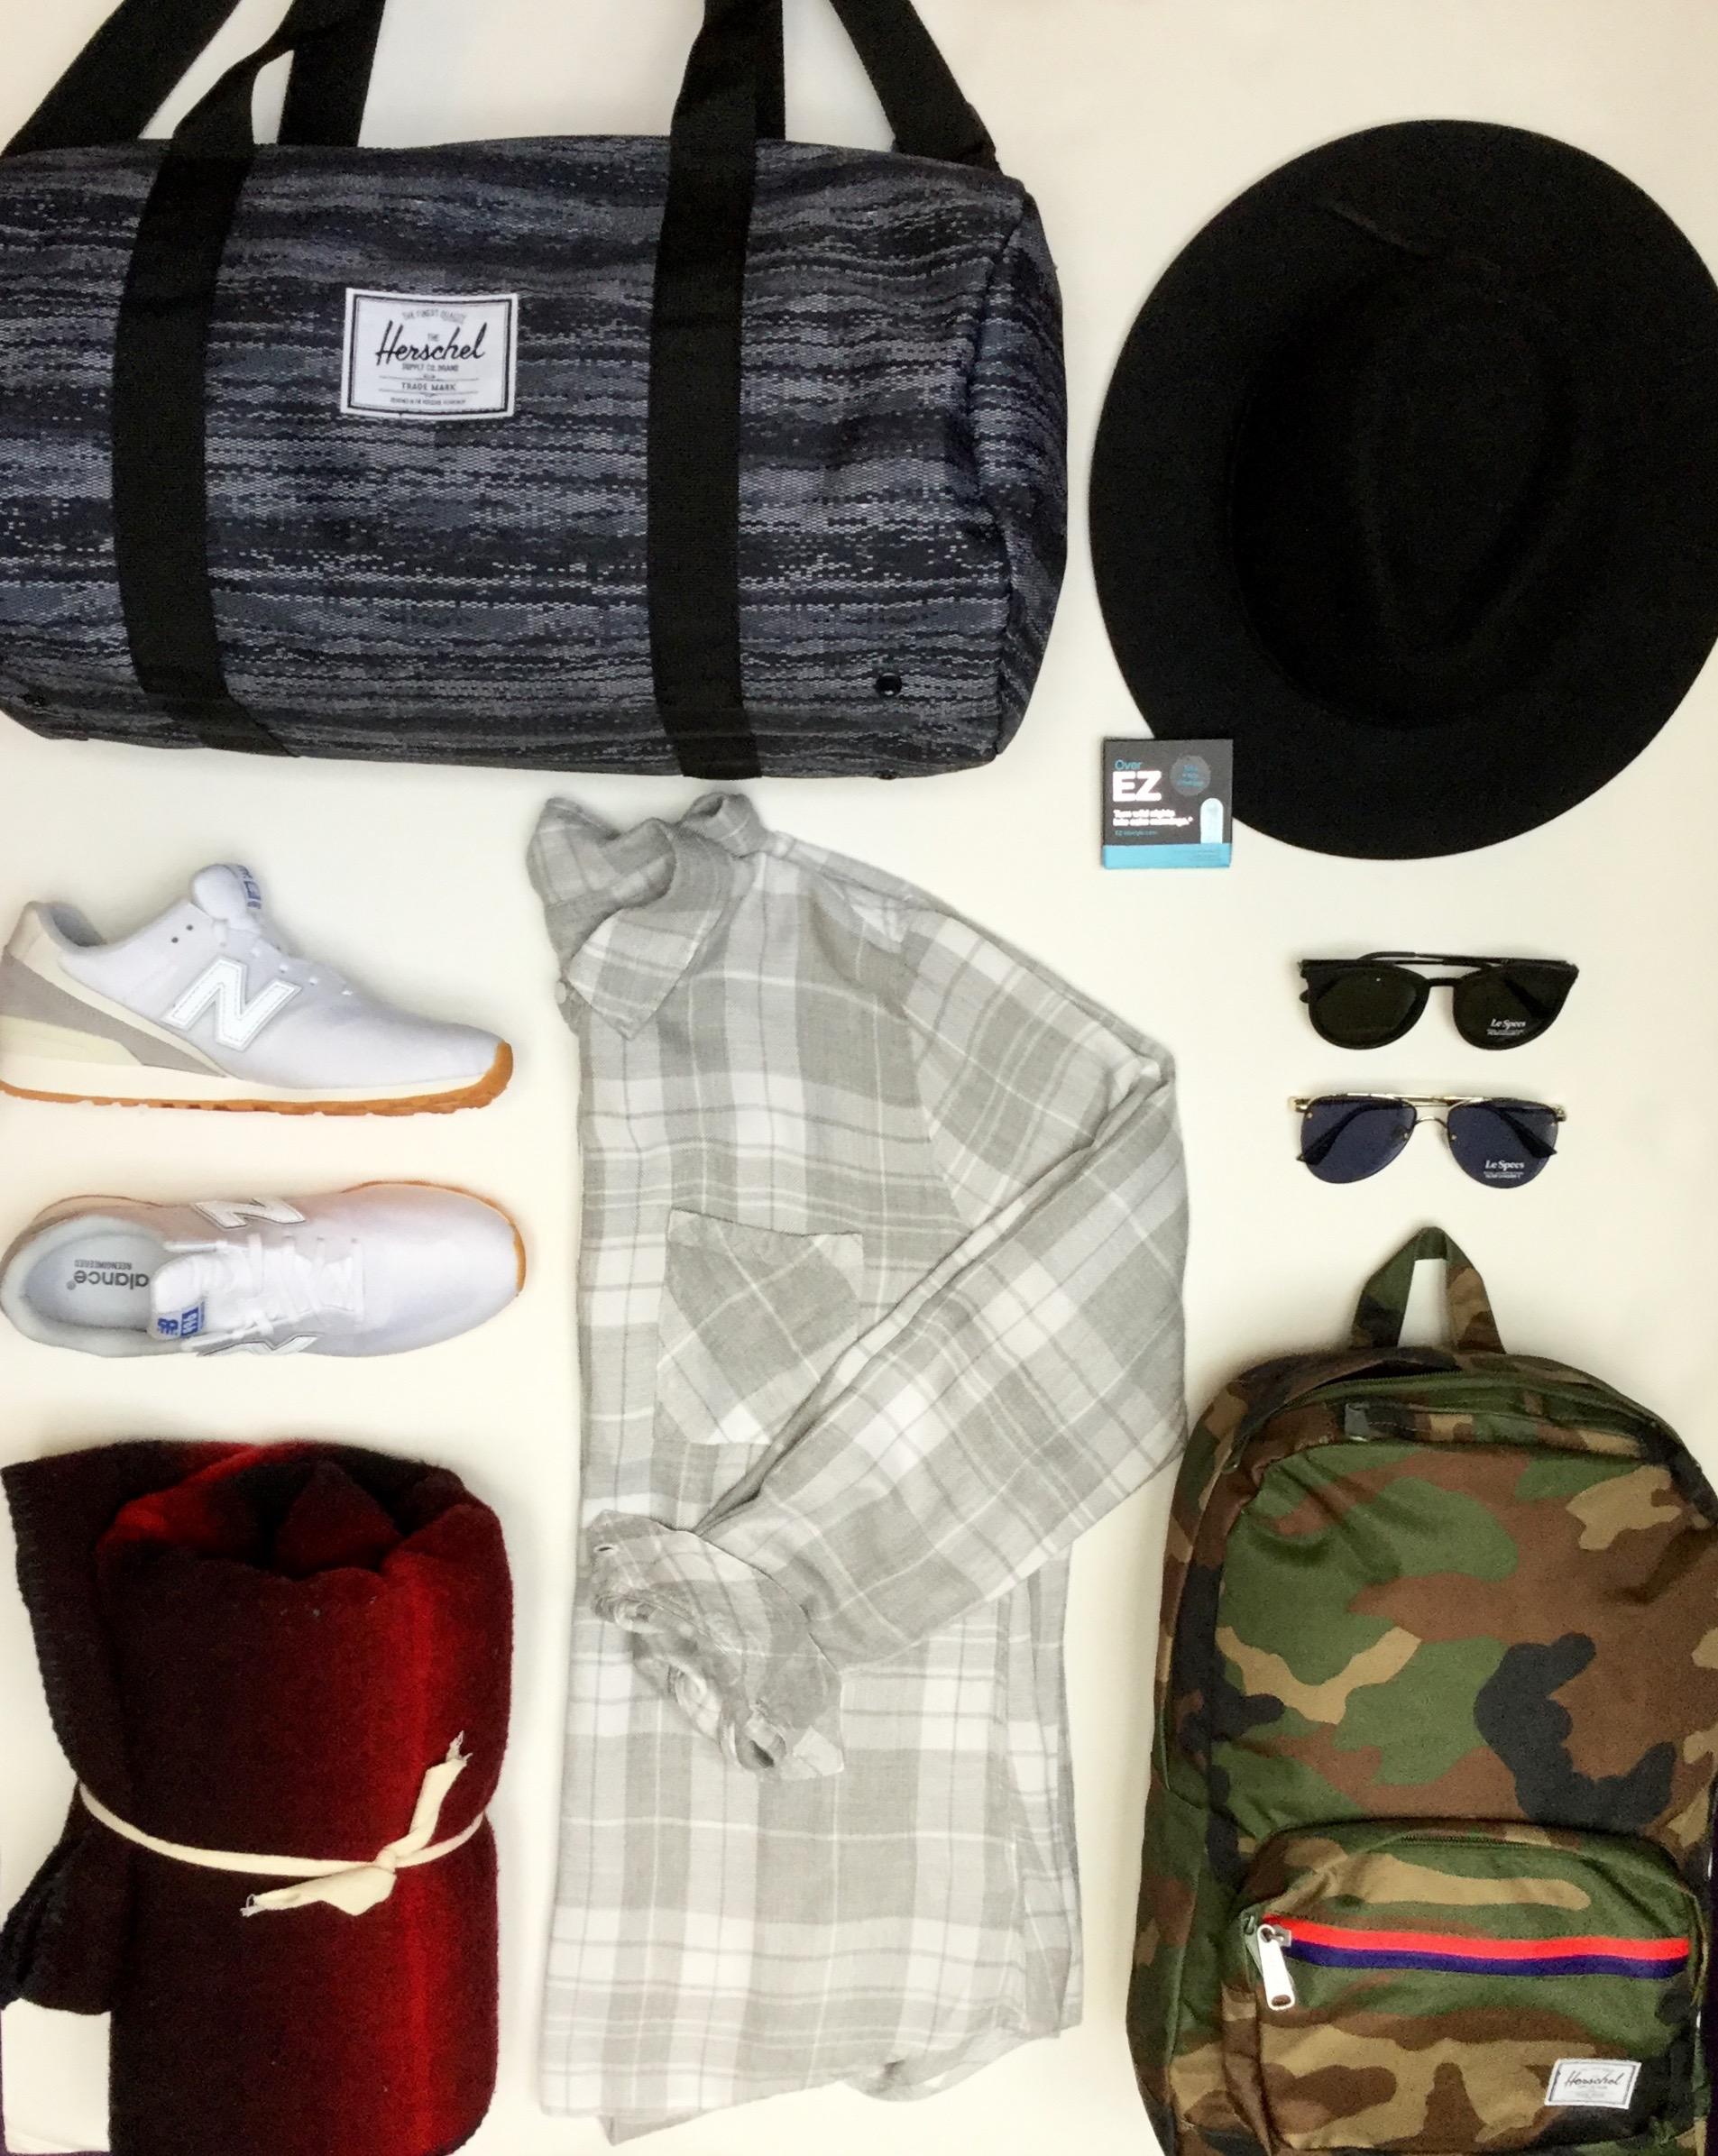 Herschel Sutton Bag $65 | Brixton Hat $80 | New Balance Retro Runners $130 | Le Specs Sunglasses $110 | Rails Plaid Shirt $215 | Woolrich Blanket $120 | Herschel Backpack $80